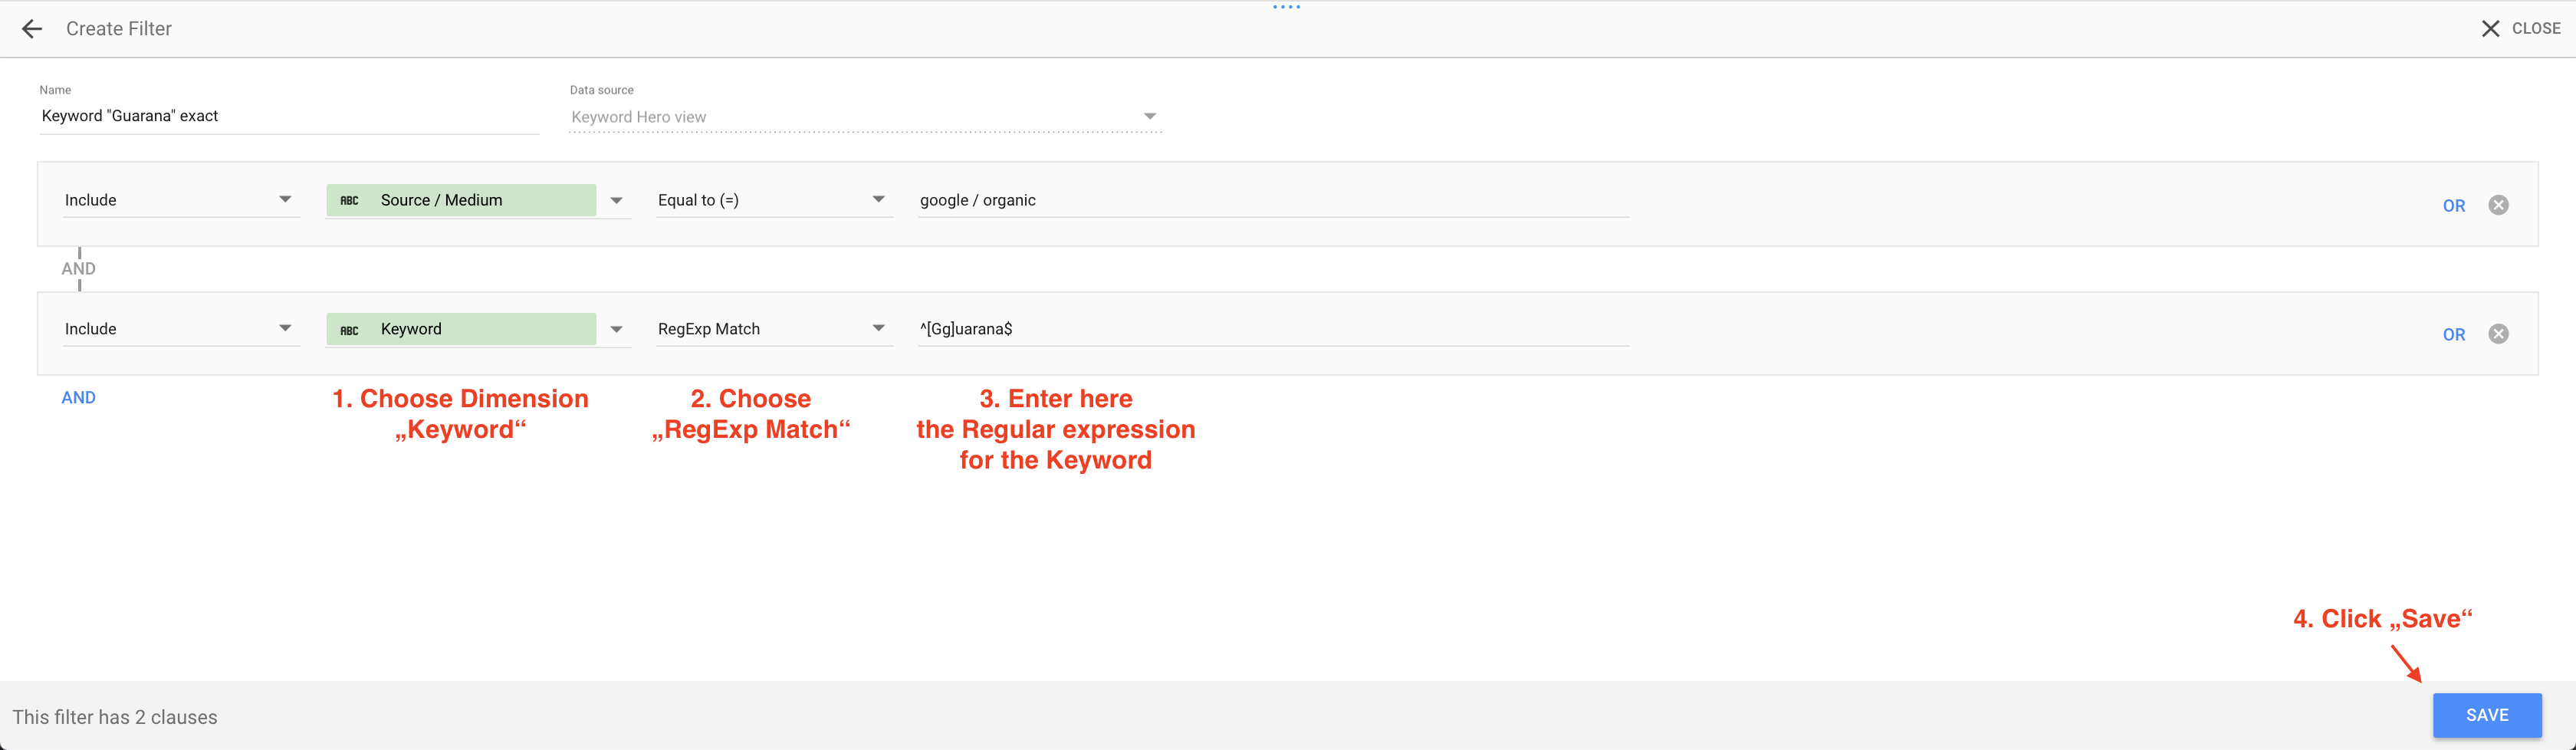 Google data studio create keyword filter